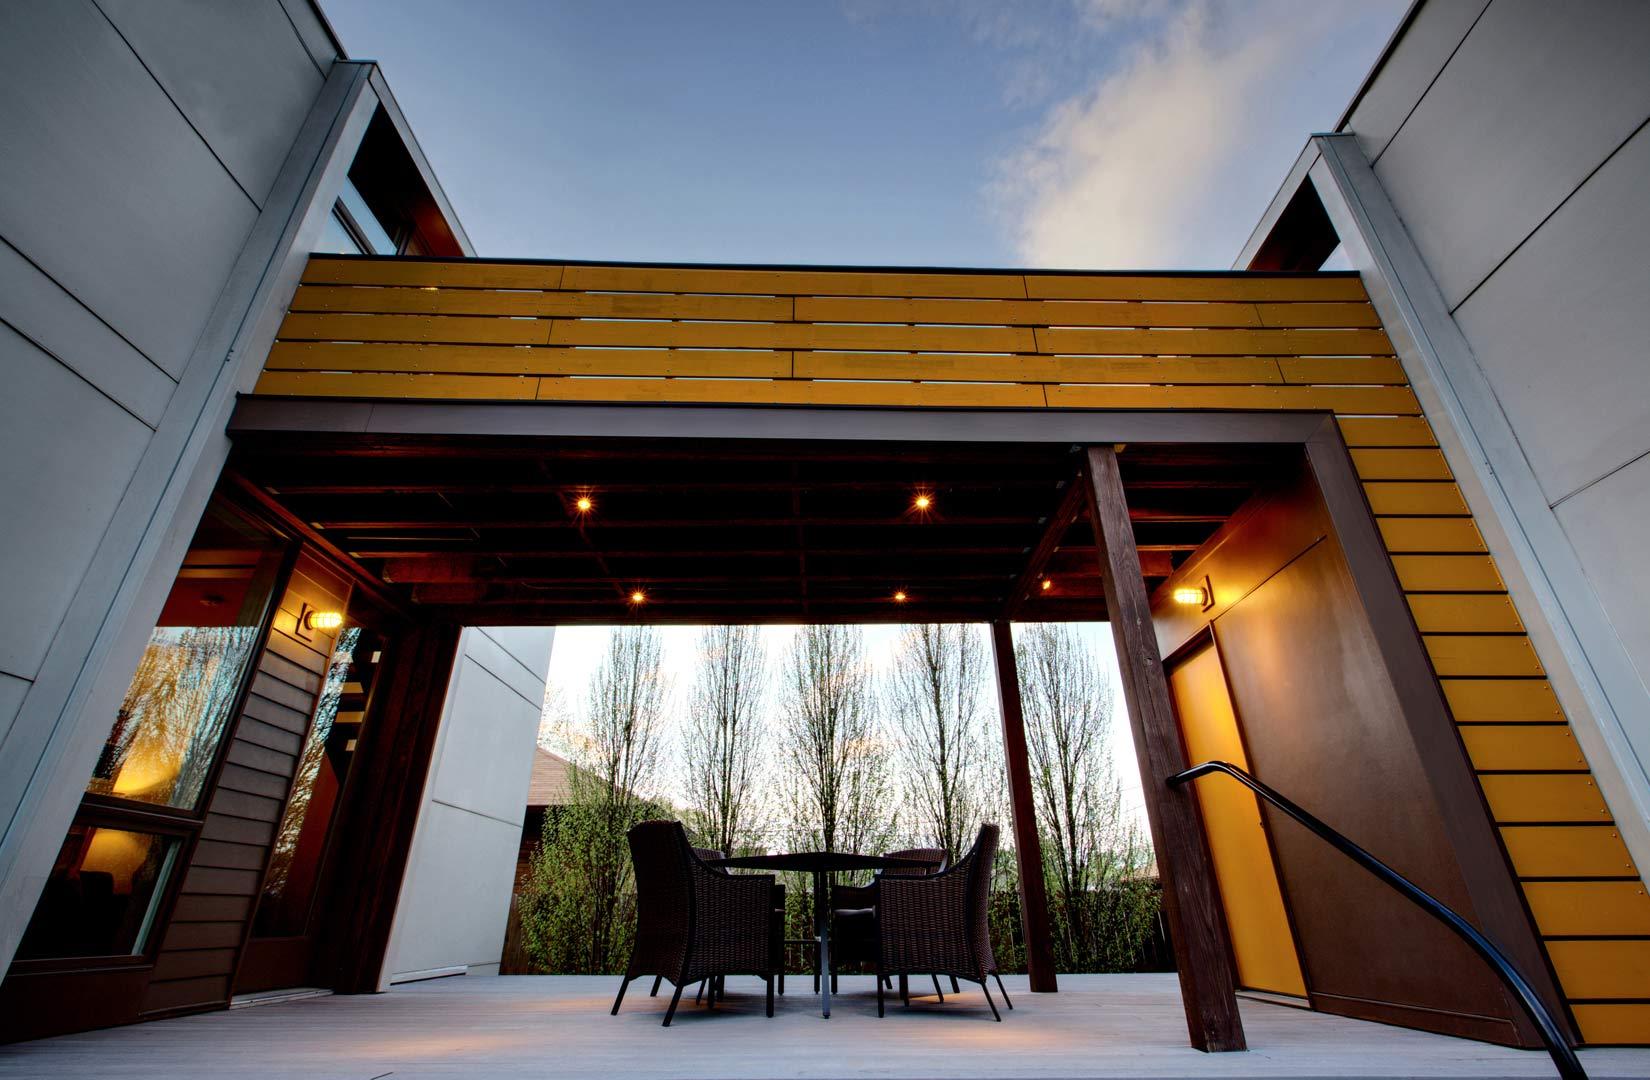 Classic Irvington Tudor Remodel - Housequake - Bridge Spans House and Studio - HAUS Architecture, Christopher Short, Indianapolis Architect